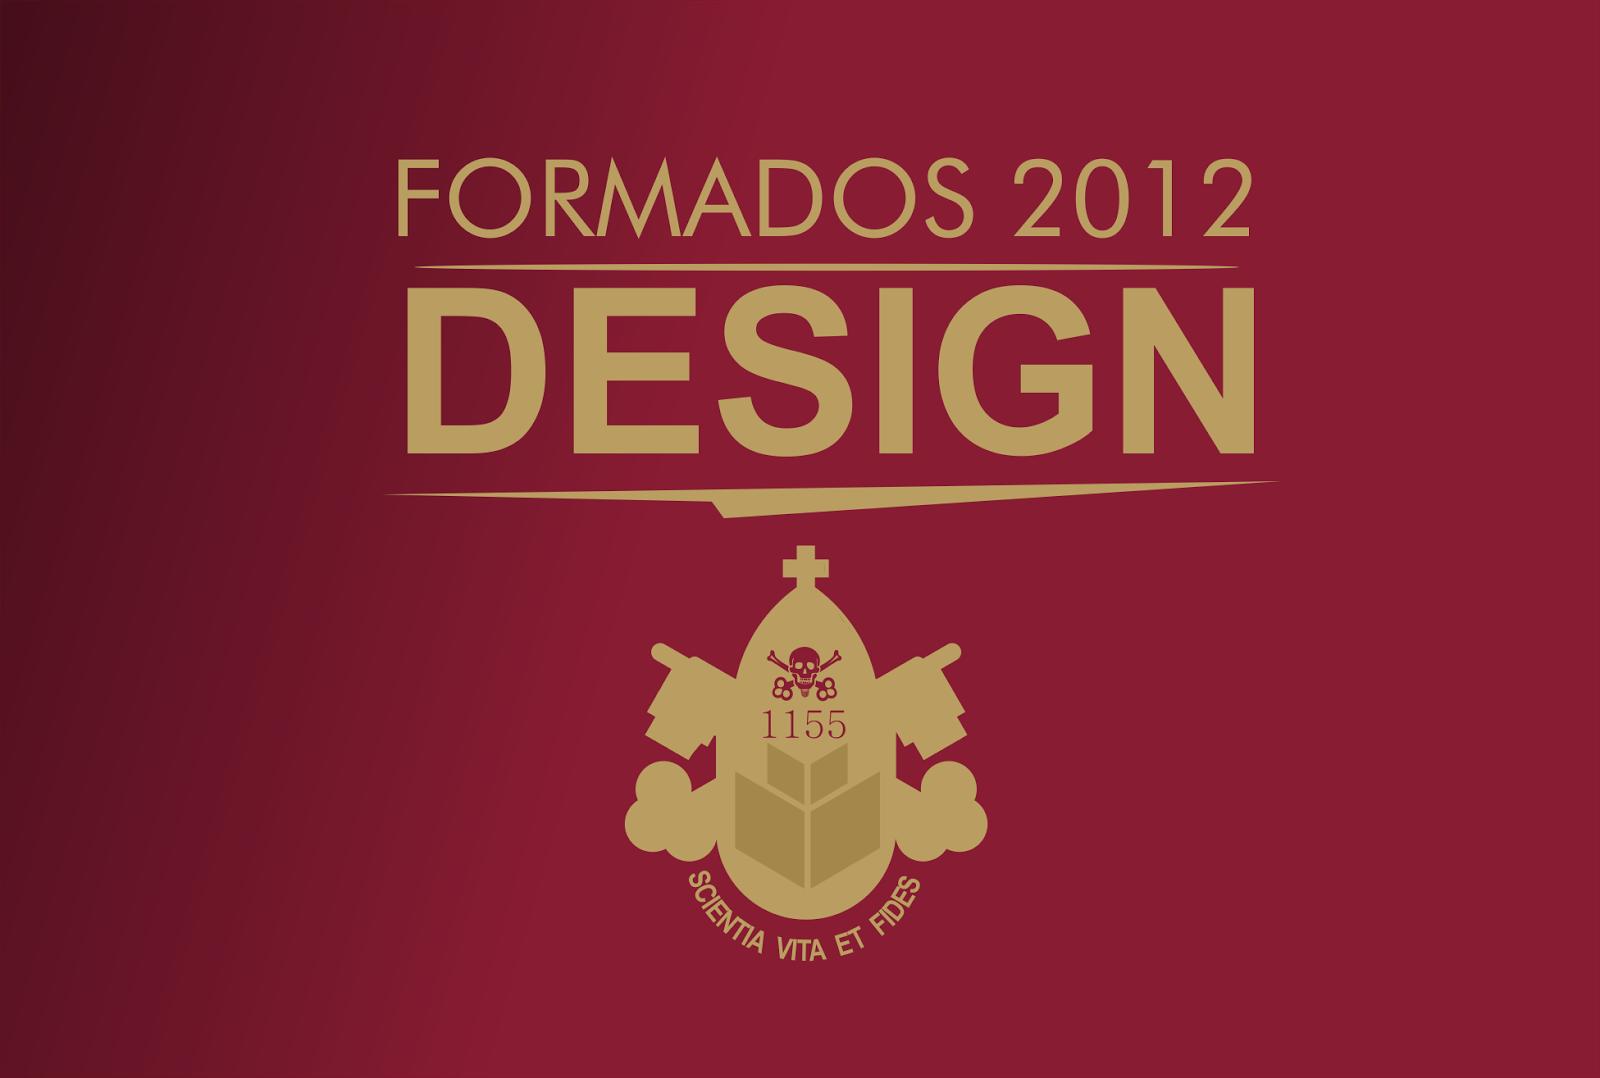 FORMADOS DESIGN 2012